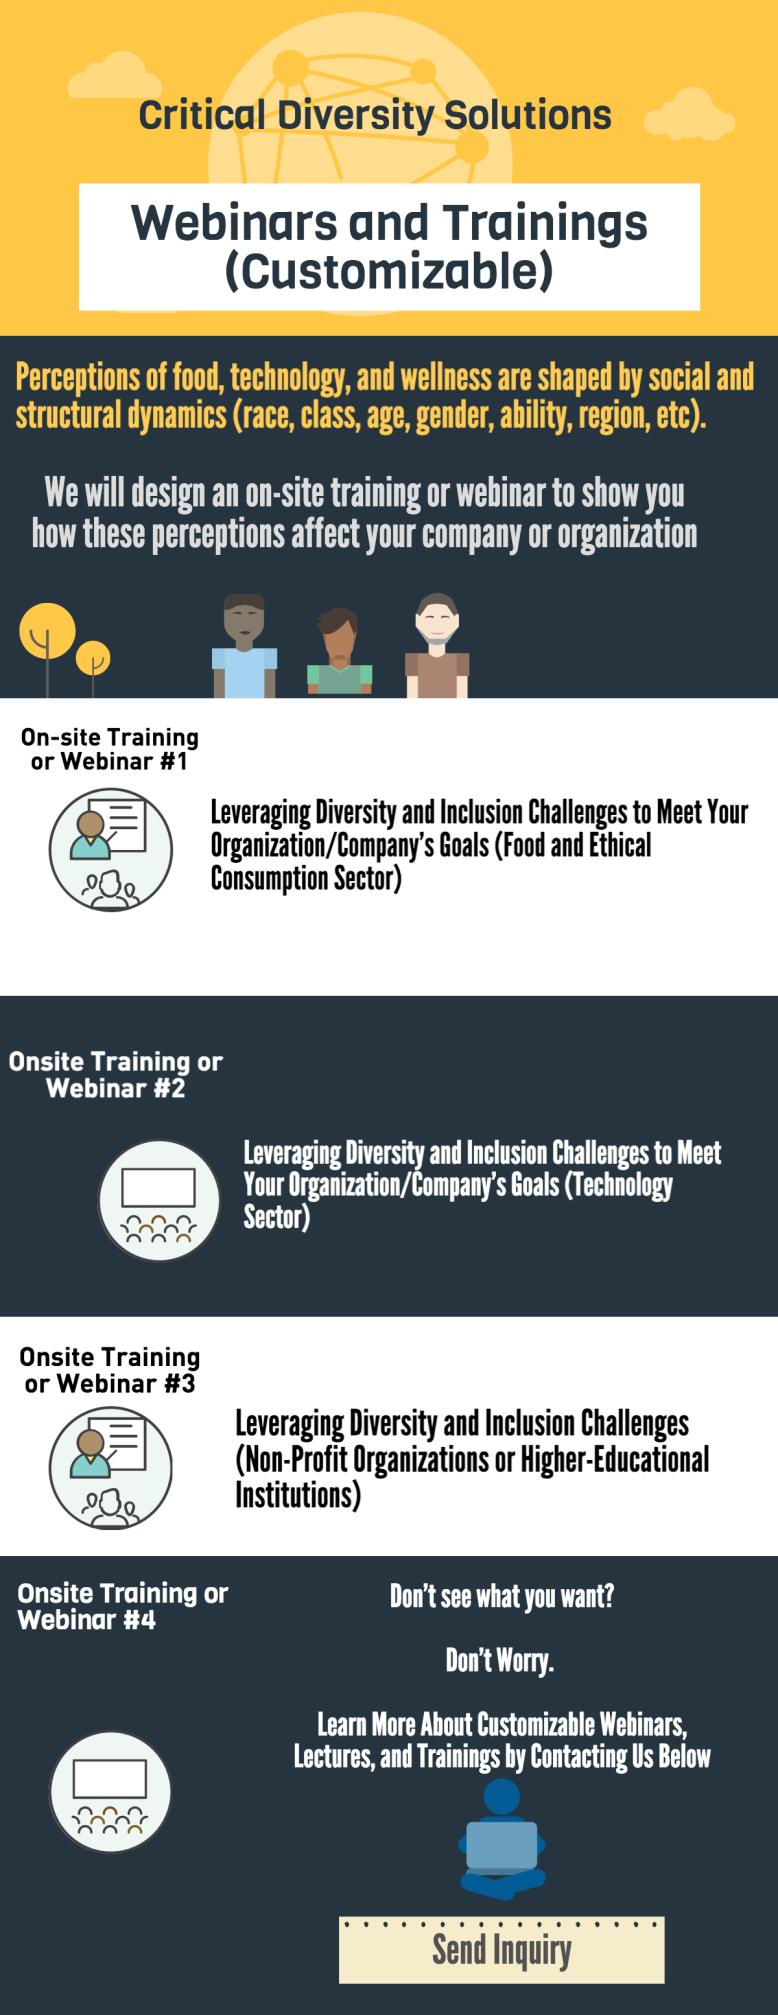 Webinars and Trainings